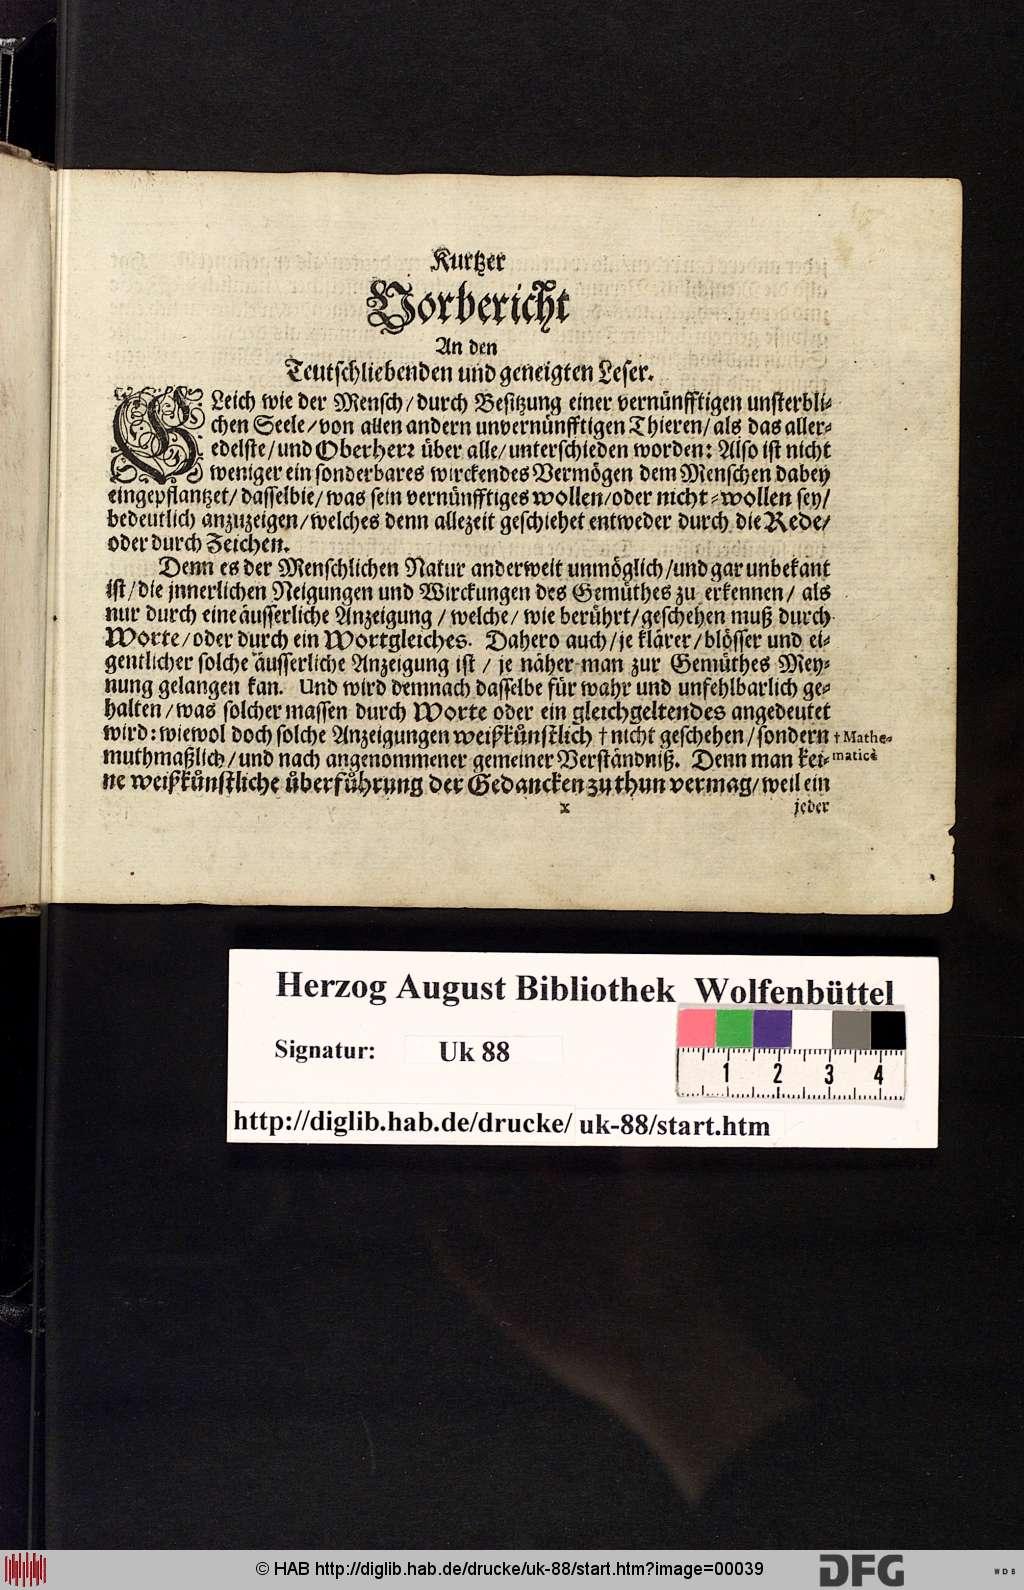 http://diglib.hab.de/drucke/uk-88/00039.jpg